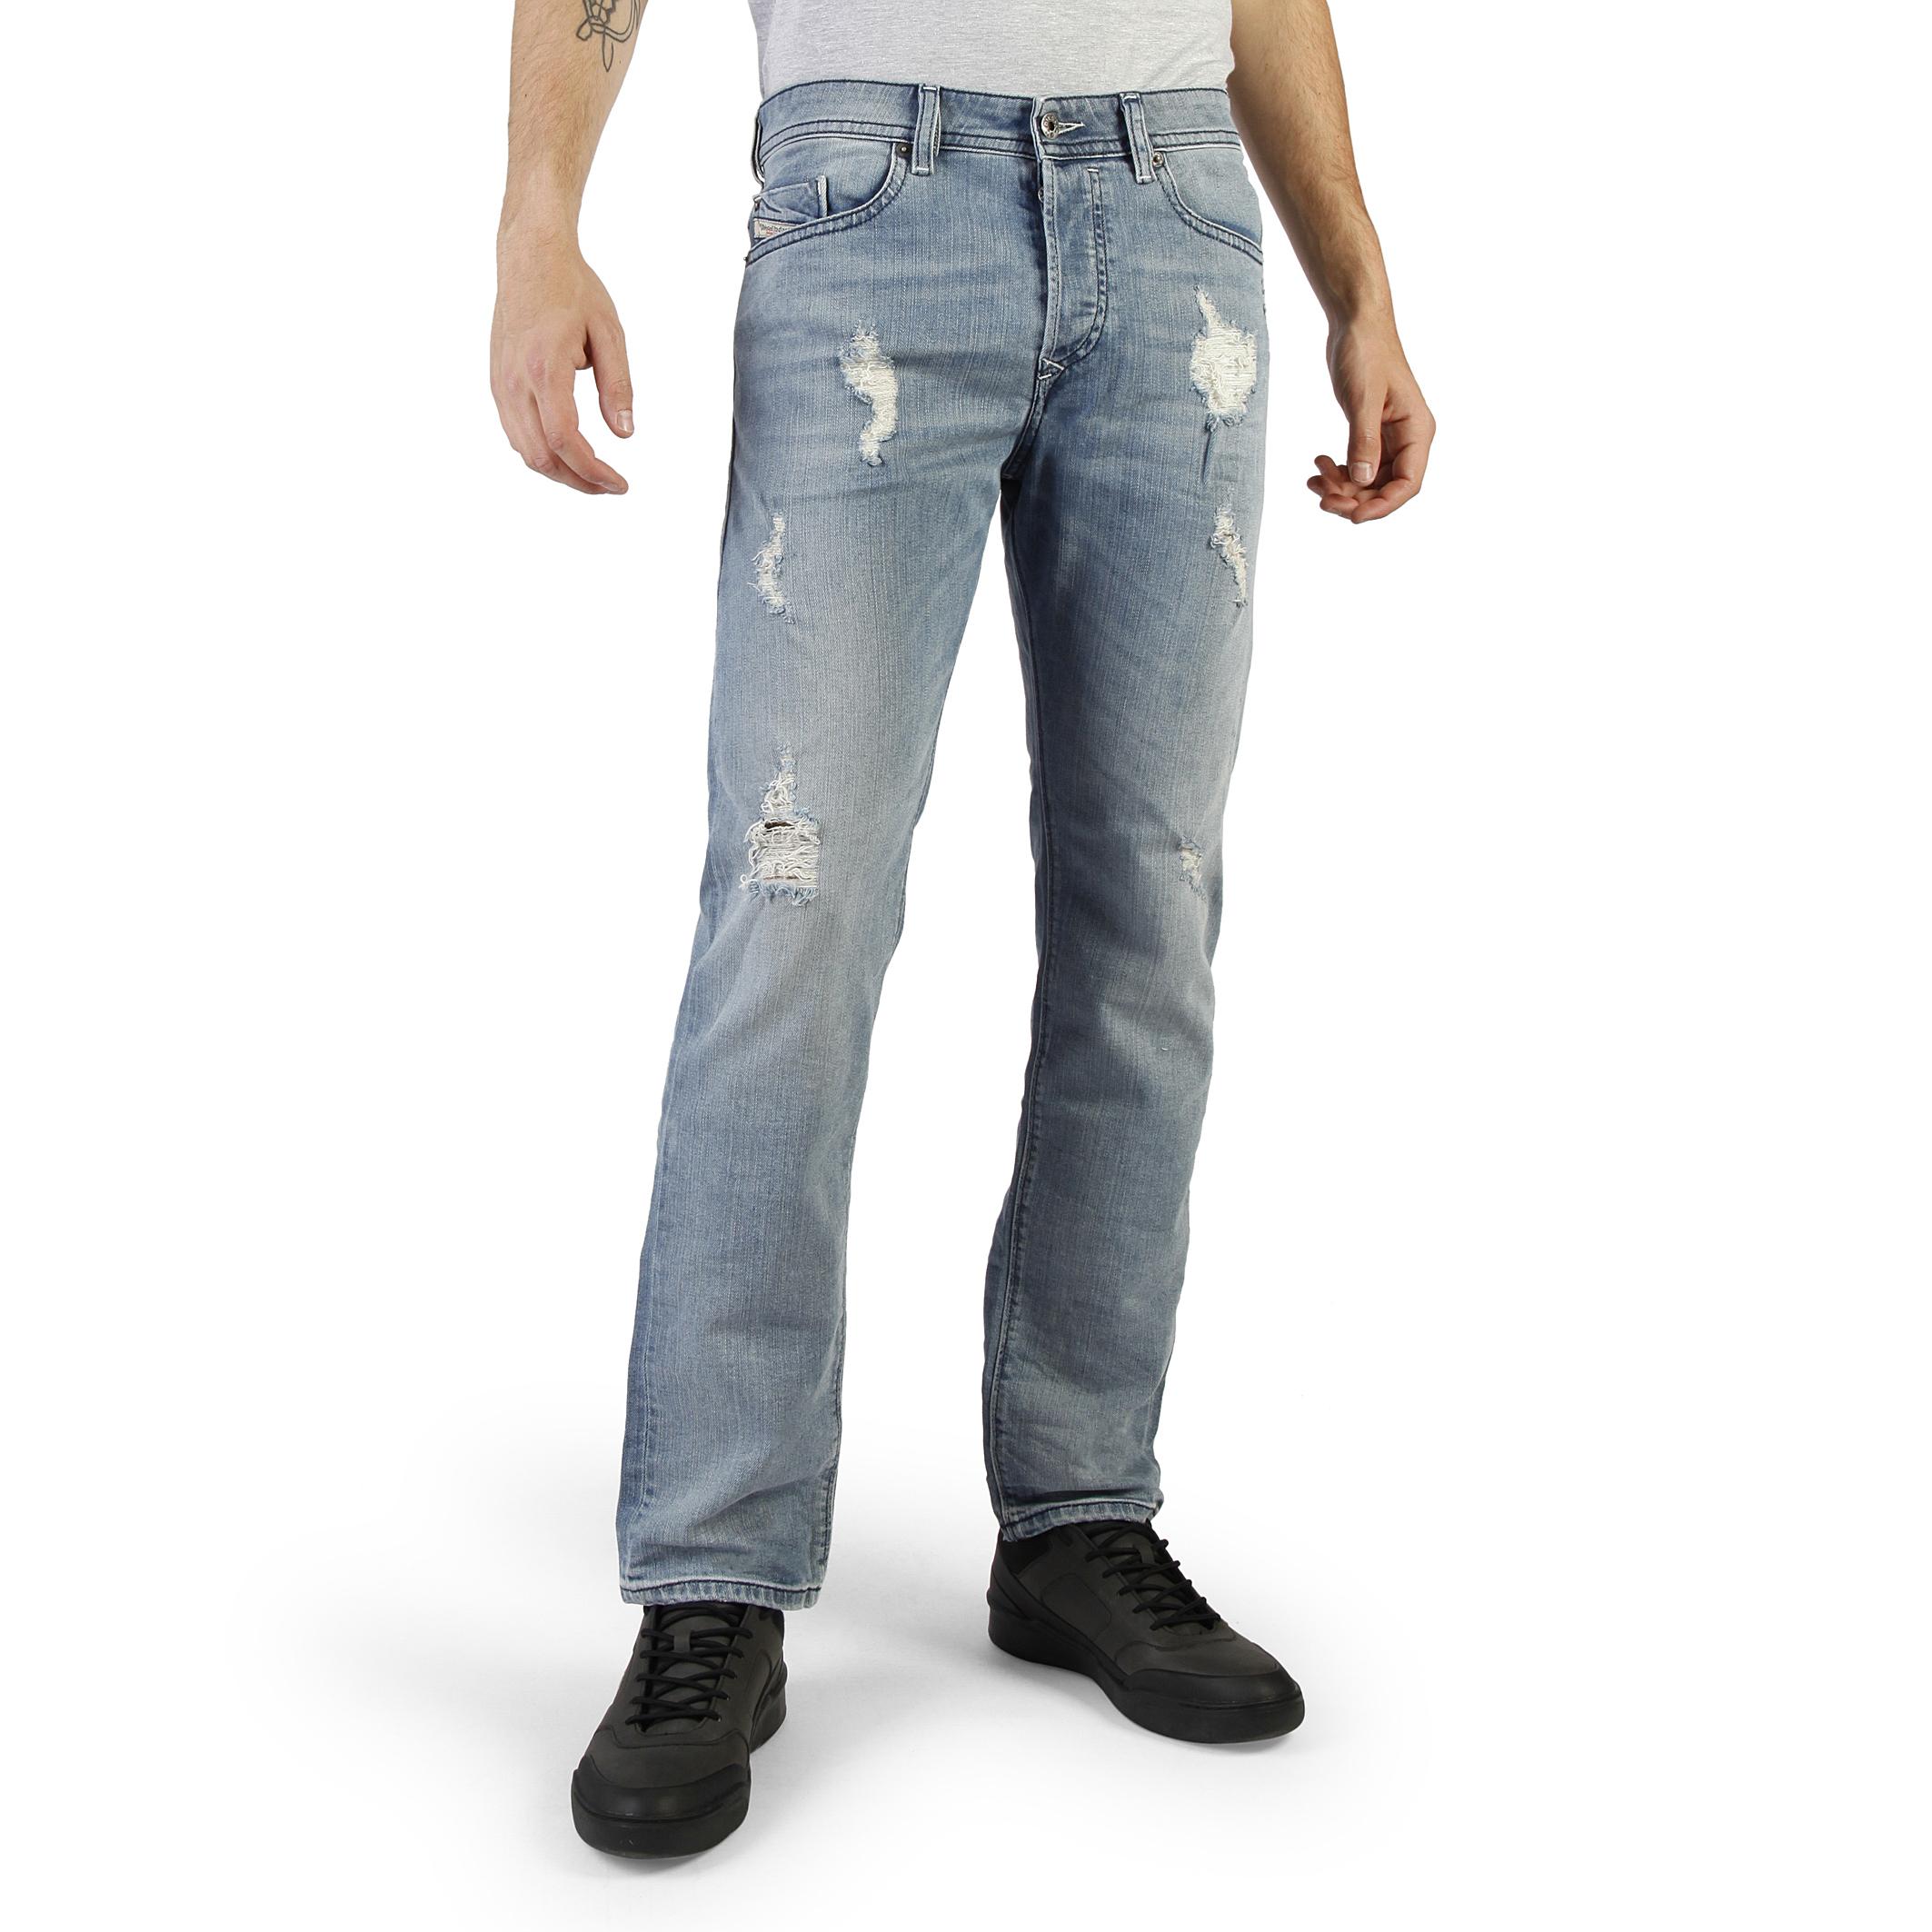 Jeans Diesel BUSTER_L32_00SDHB Uomo Blu 91463